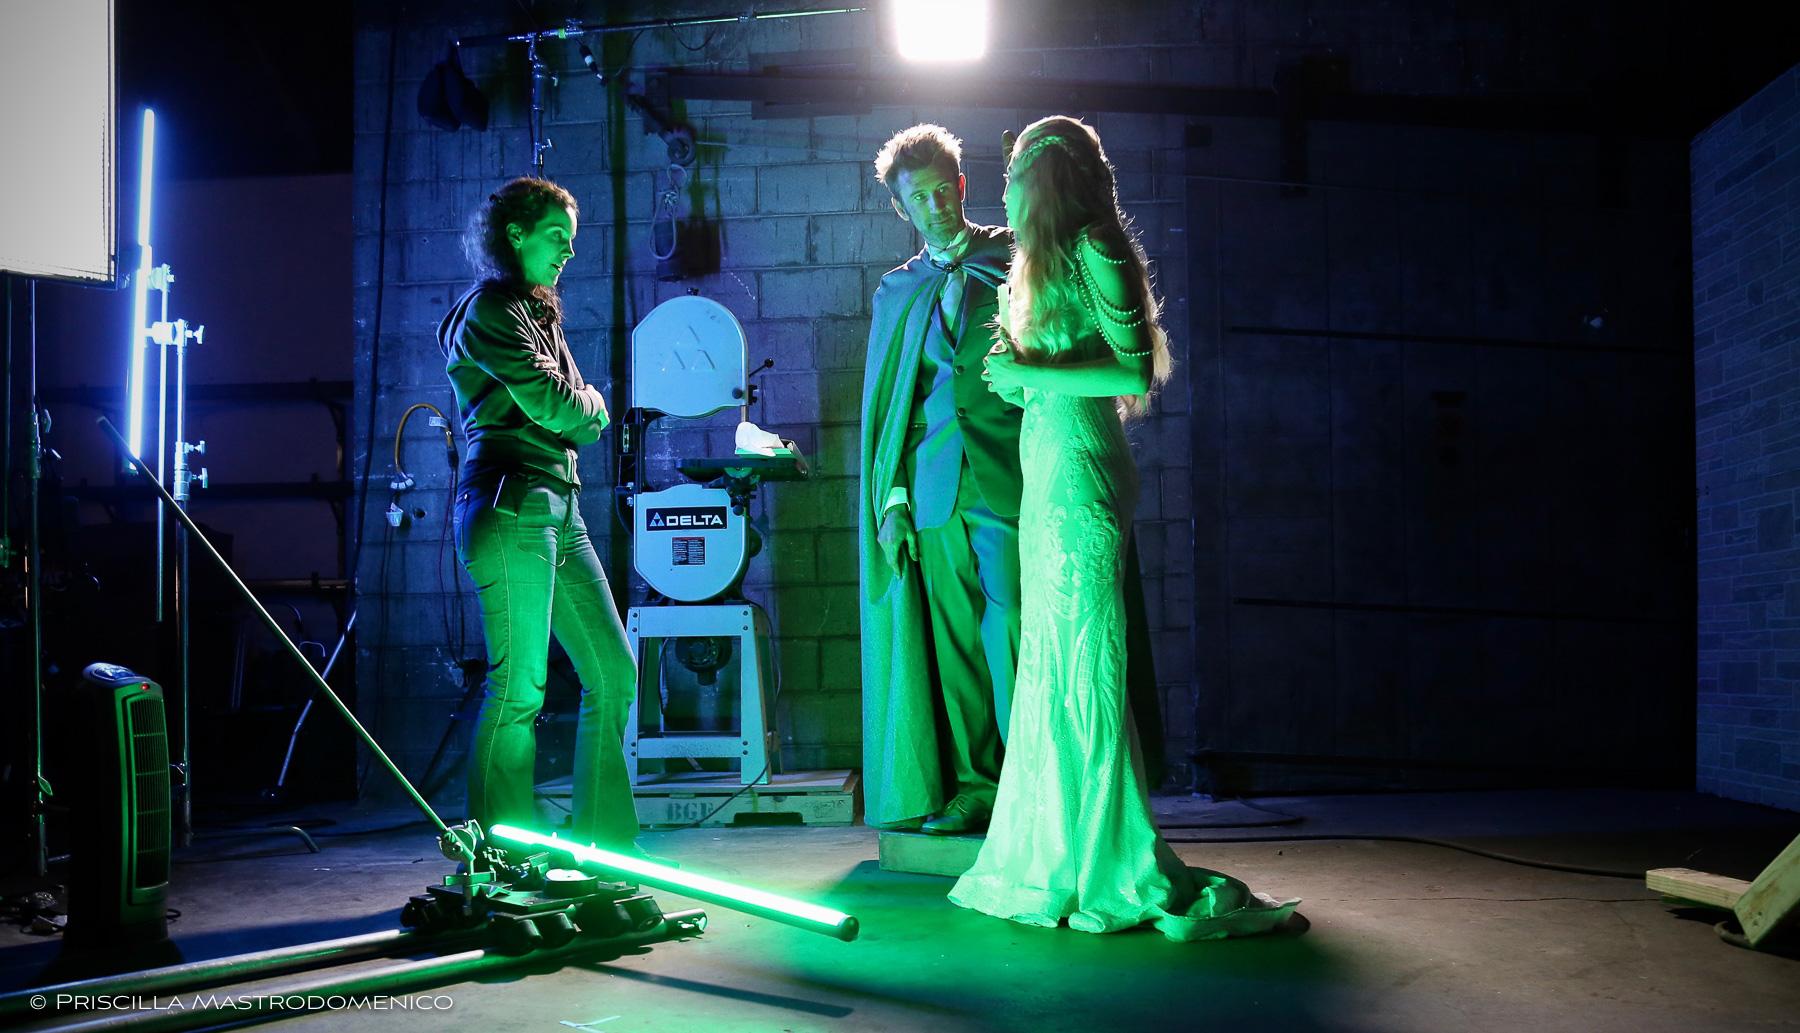 Priscilla directs Harry/Jason and Mab/Liz